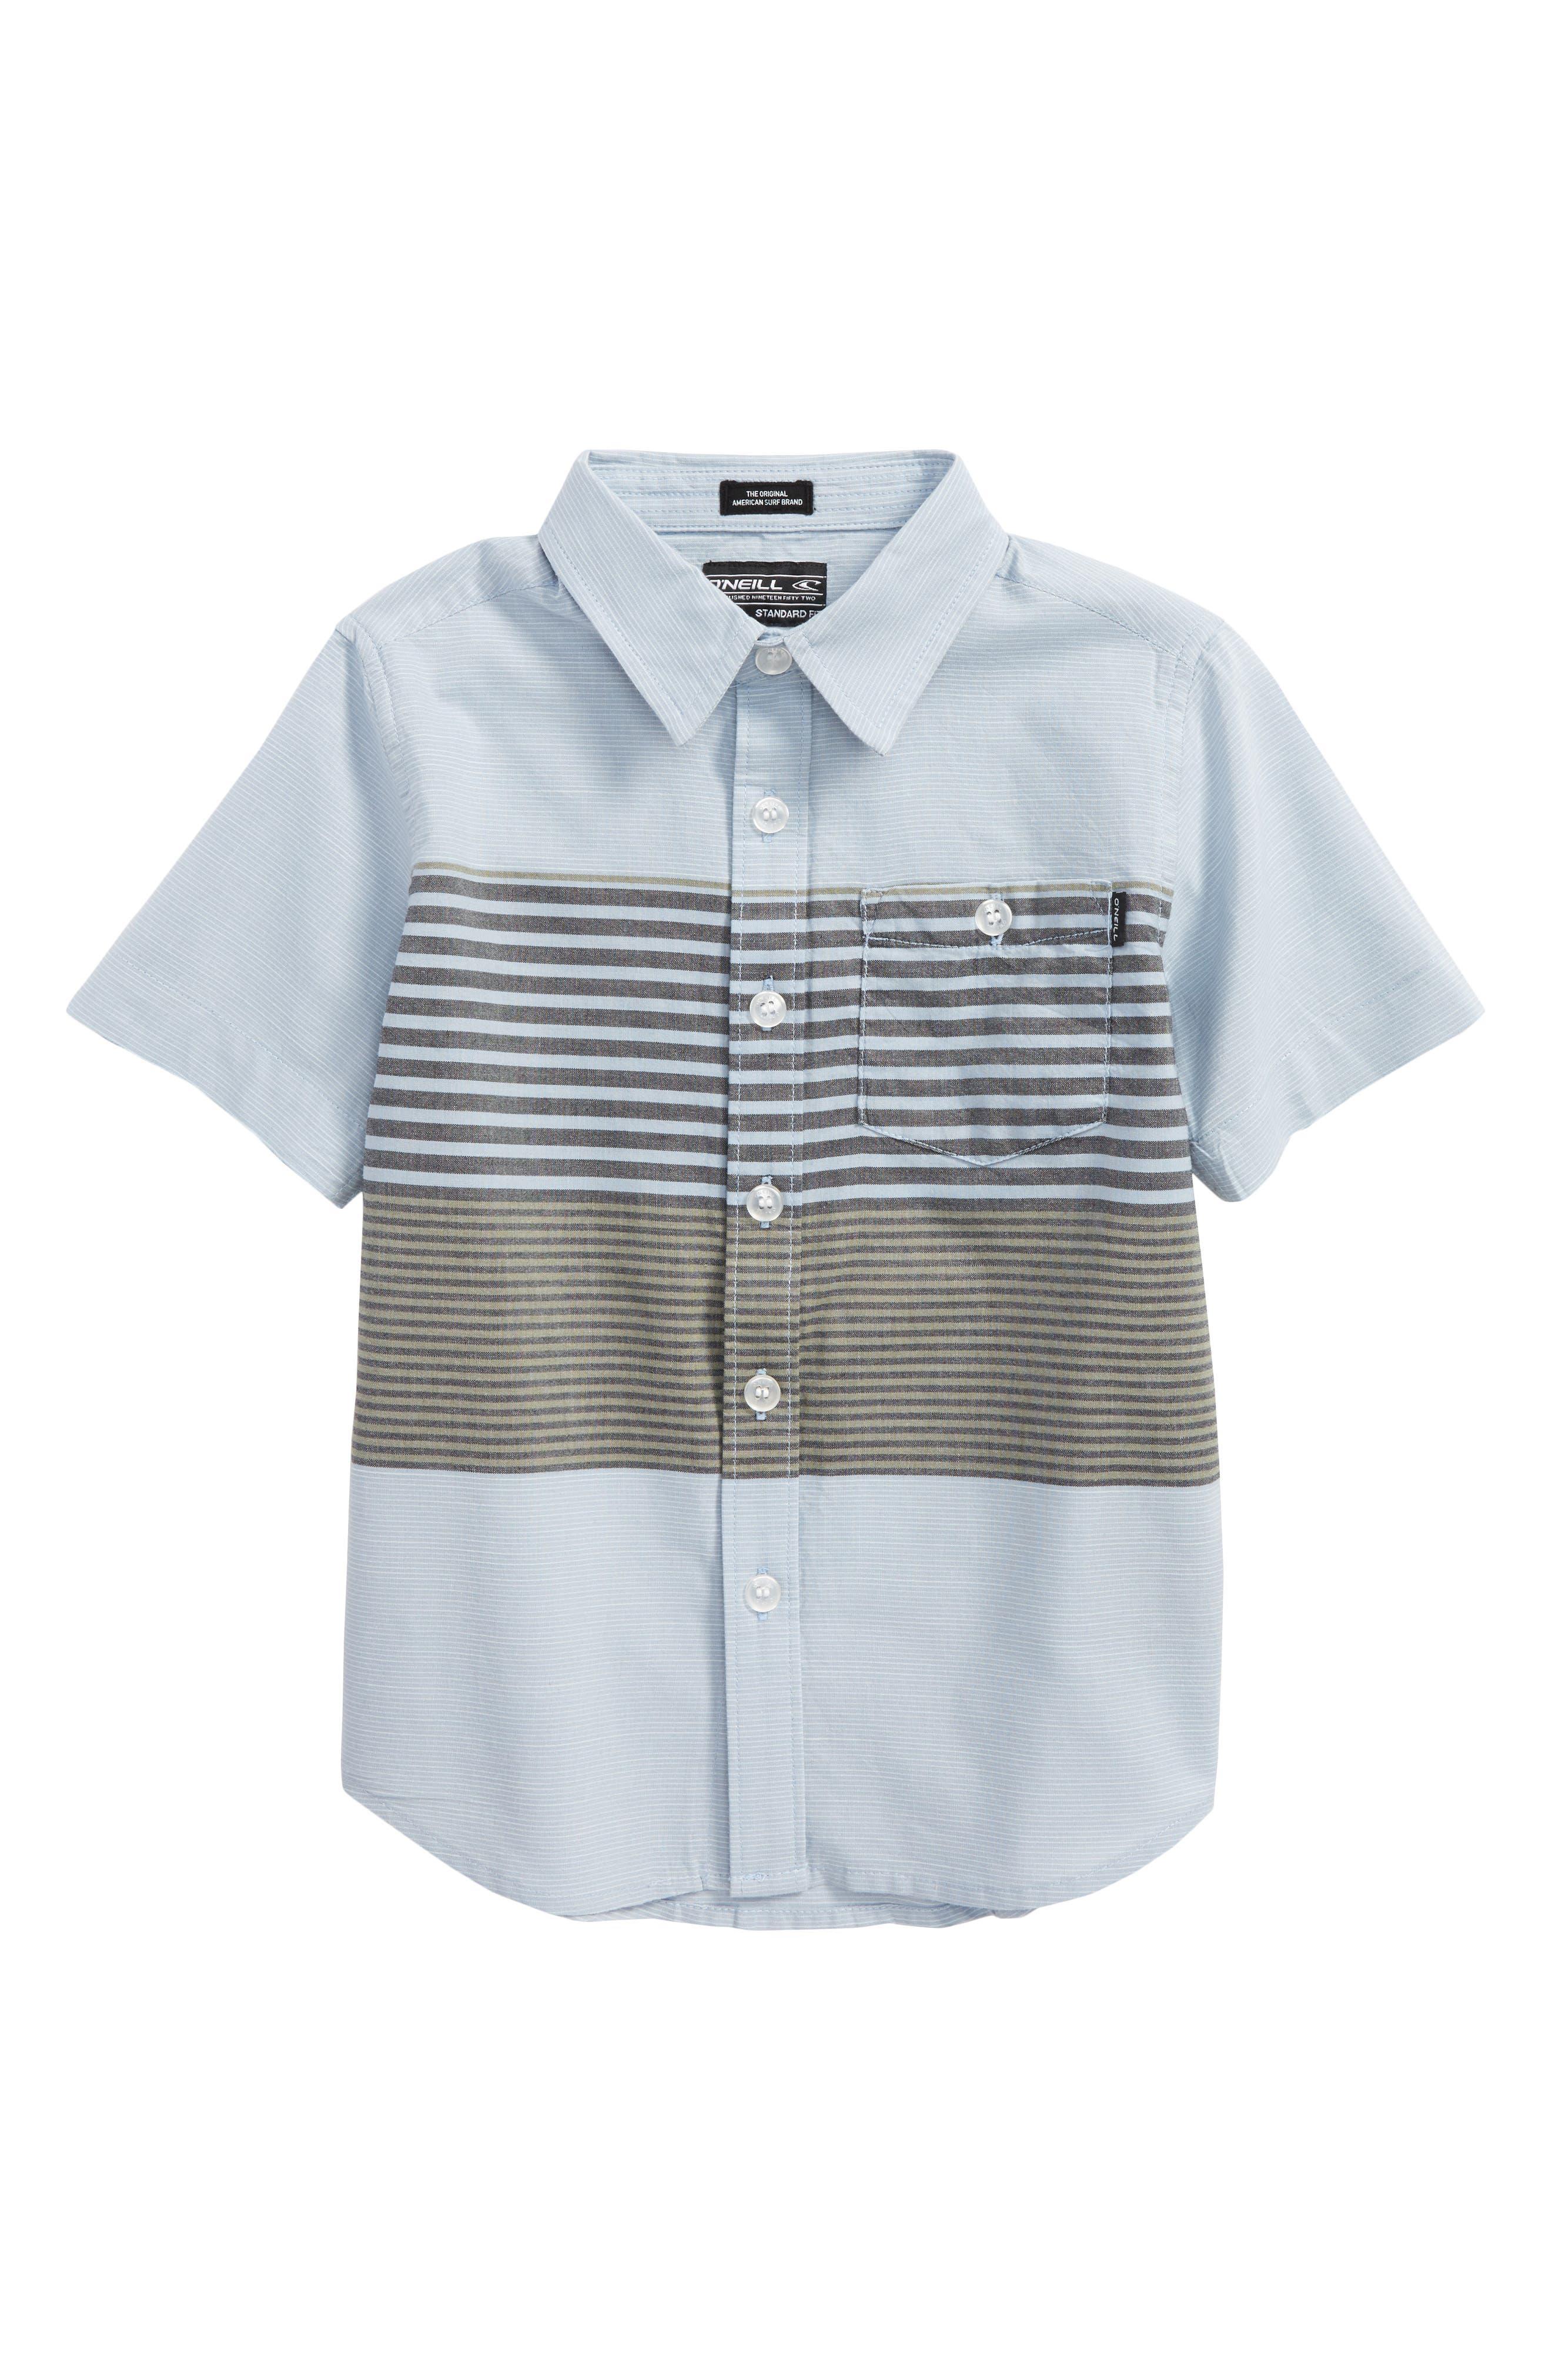 Altair Woven Shirt,                         Main,                         color, 450